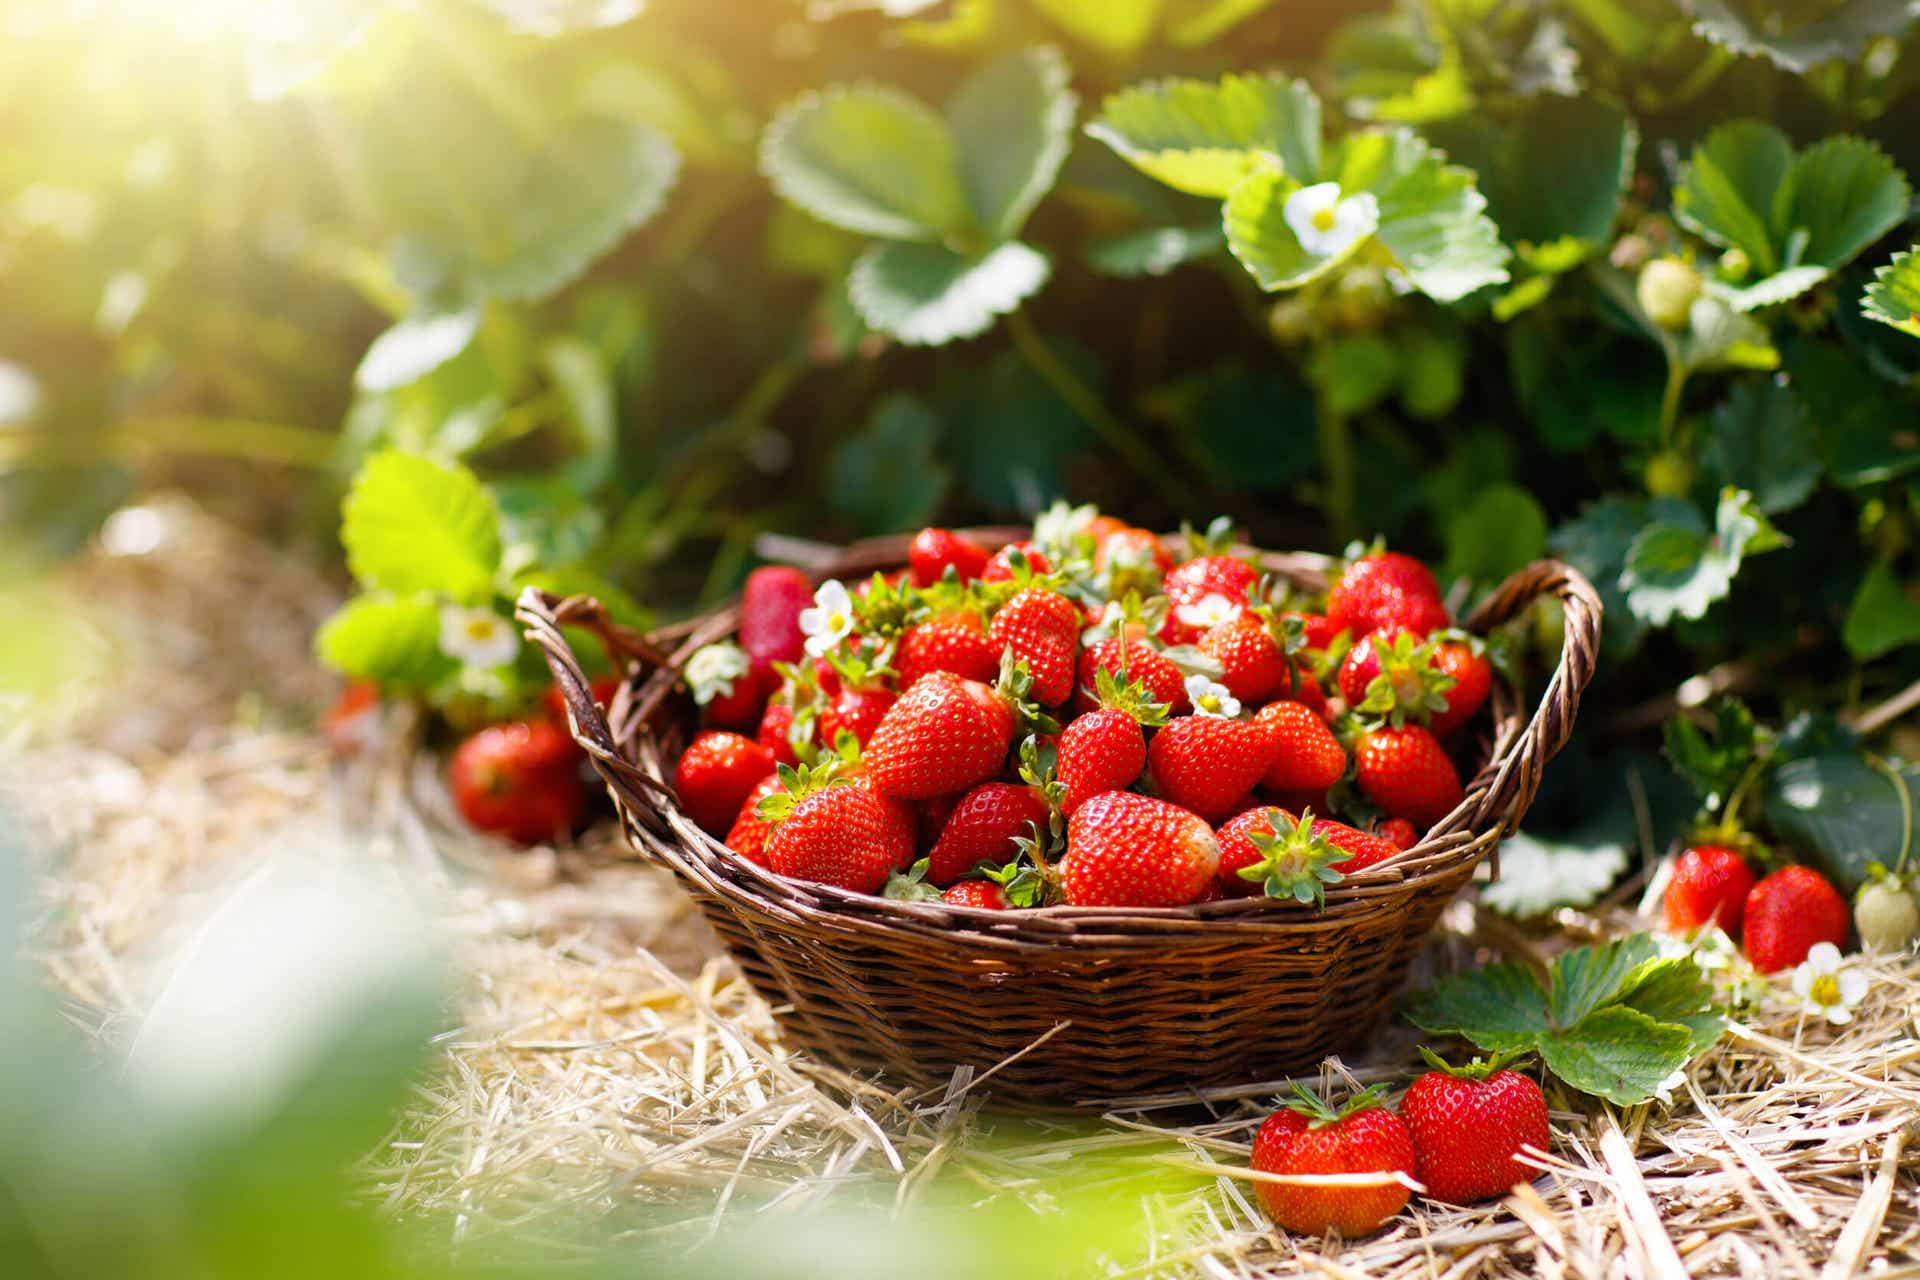 A basket of freshly picked strawberries.